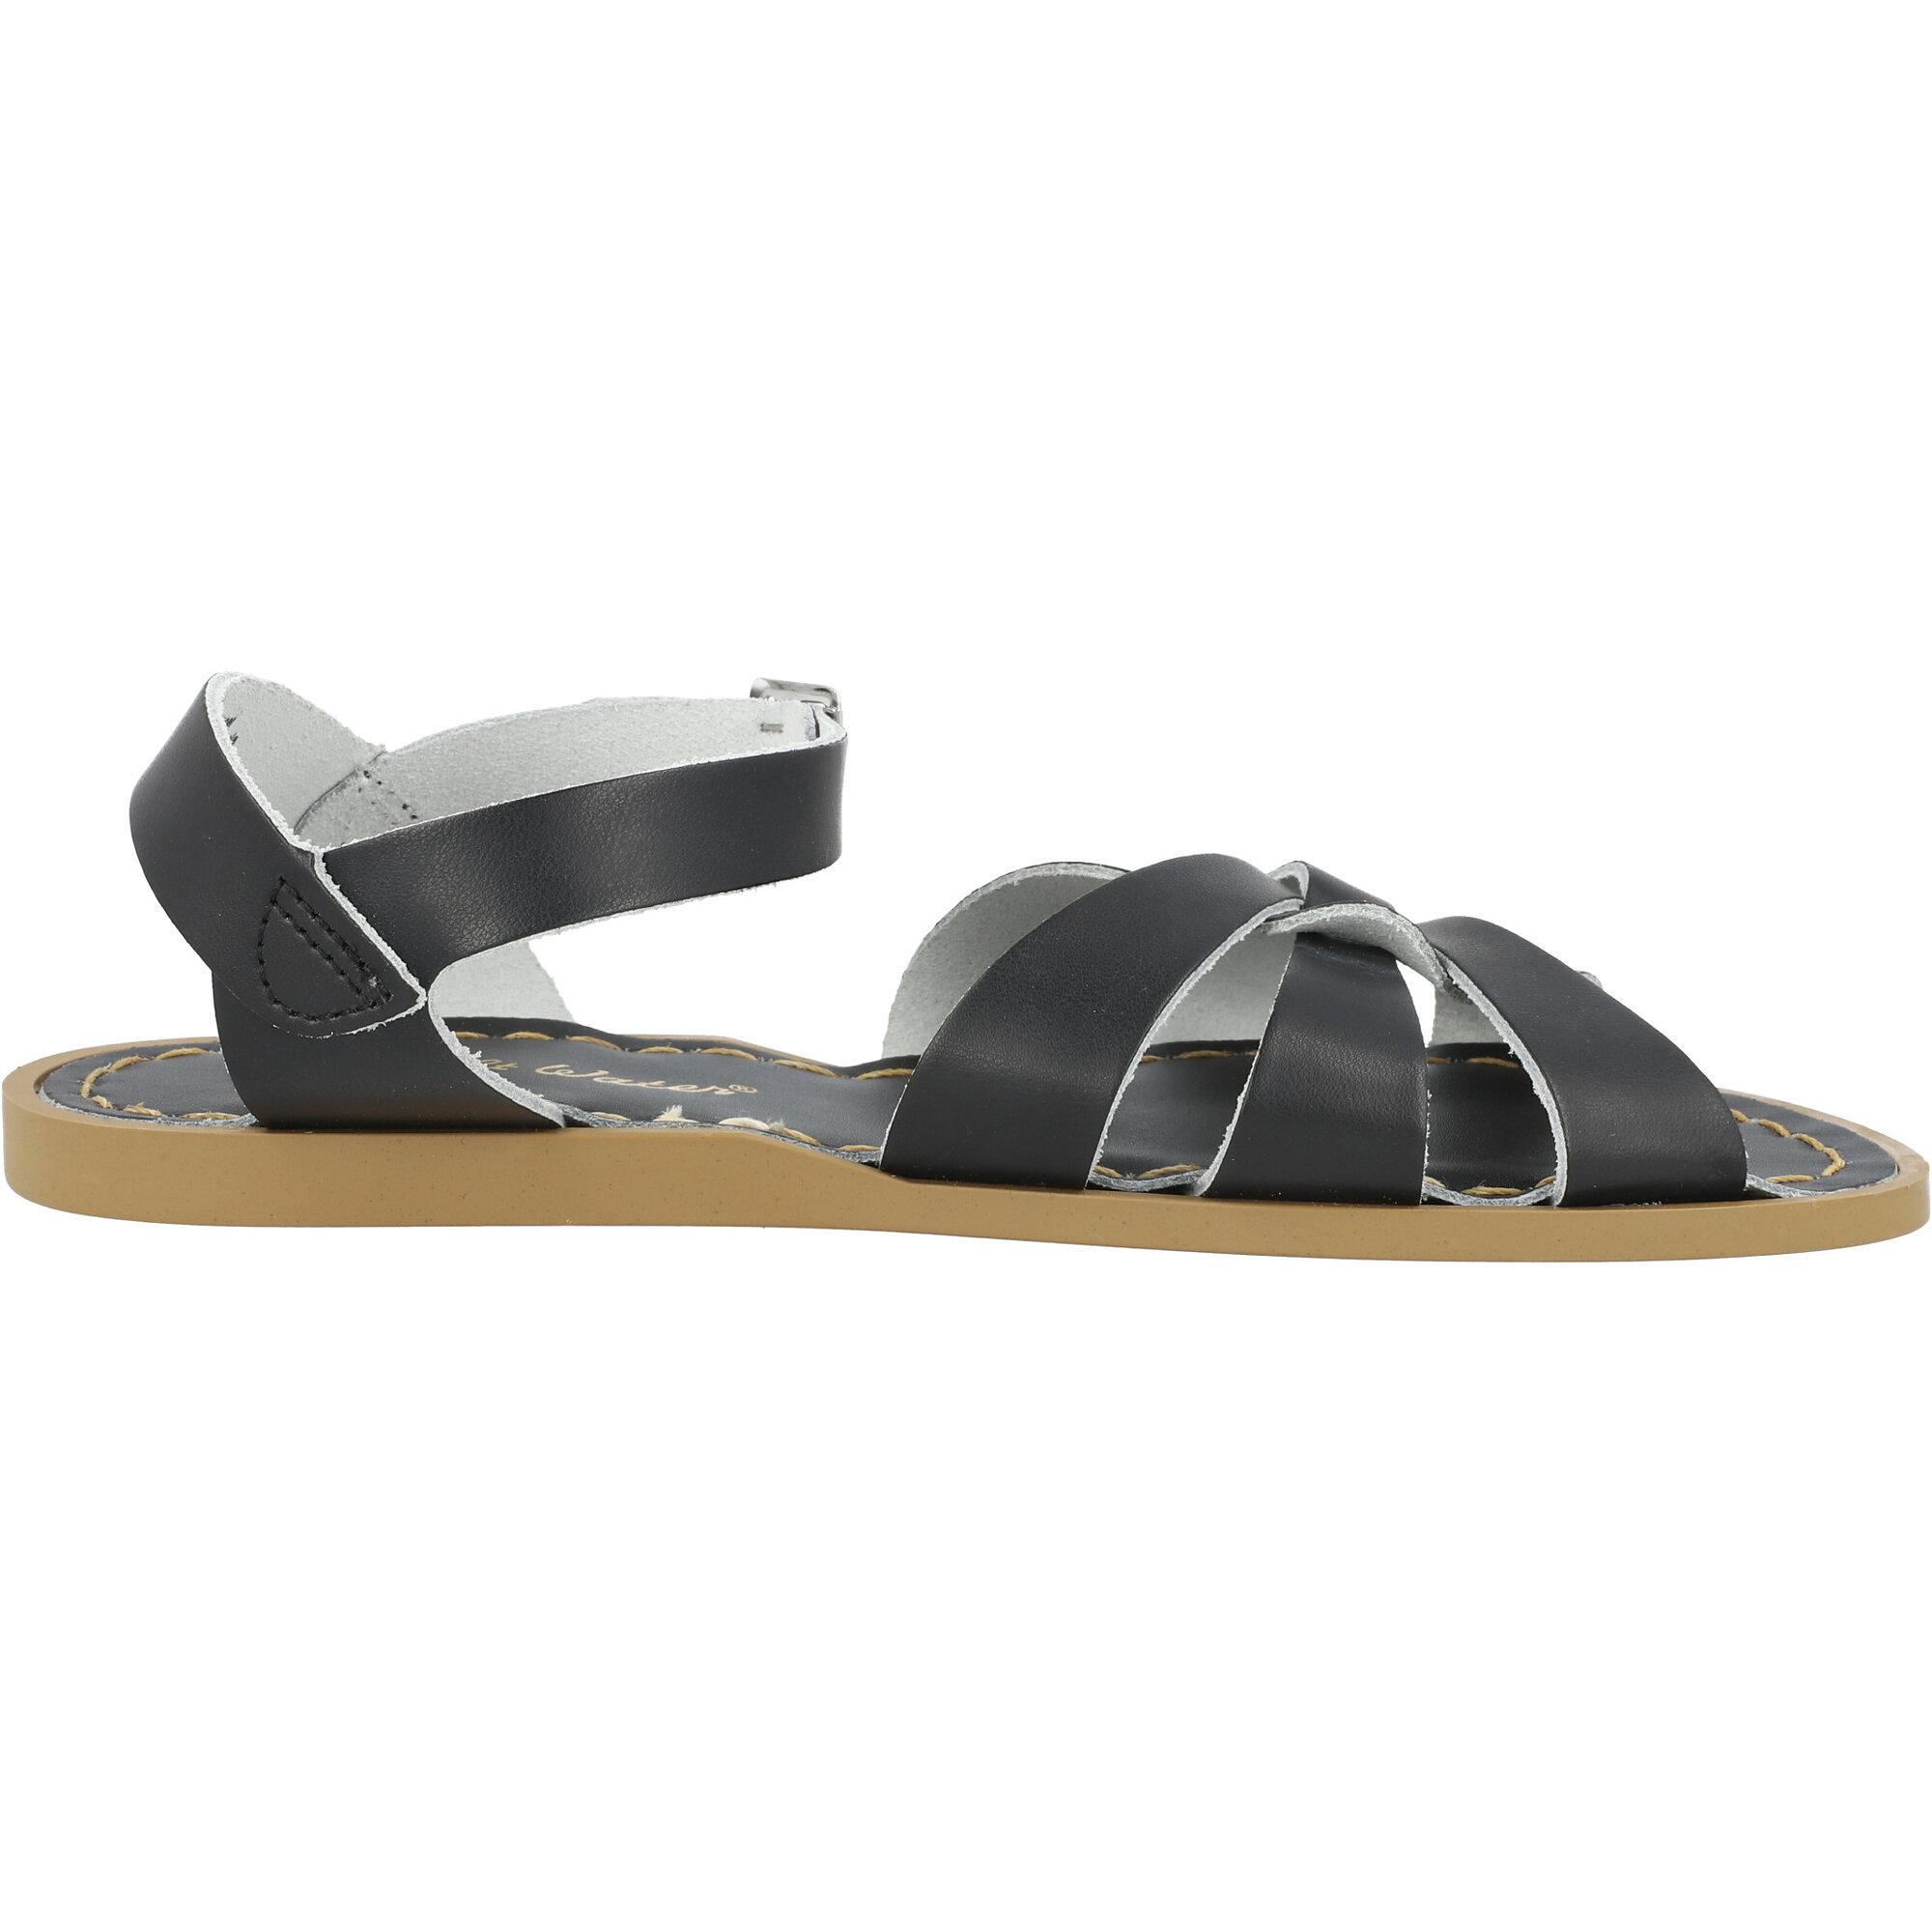 Salt Water Sandals Original Black Leather